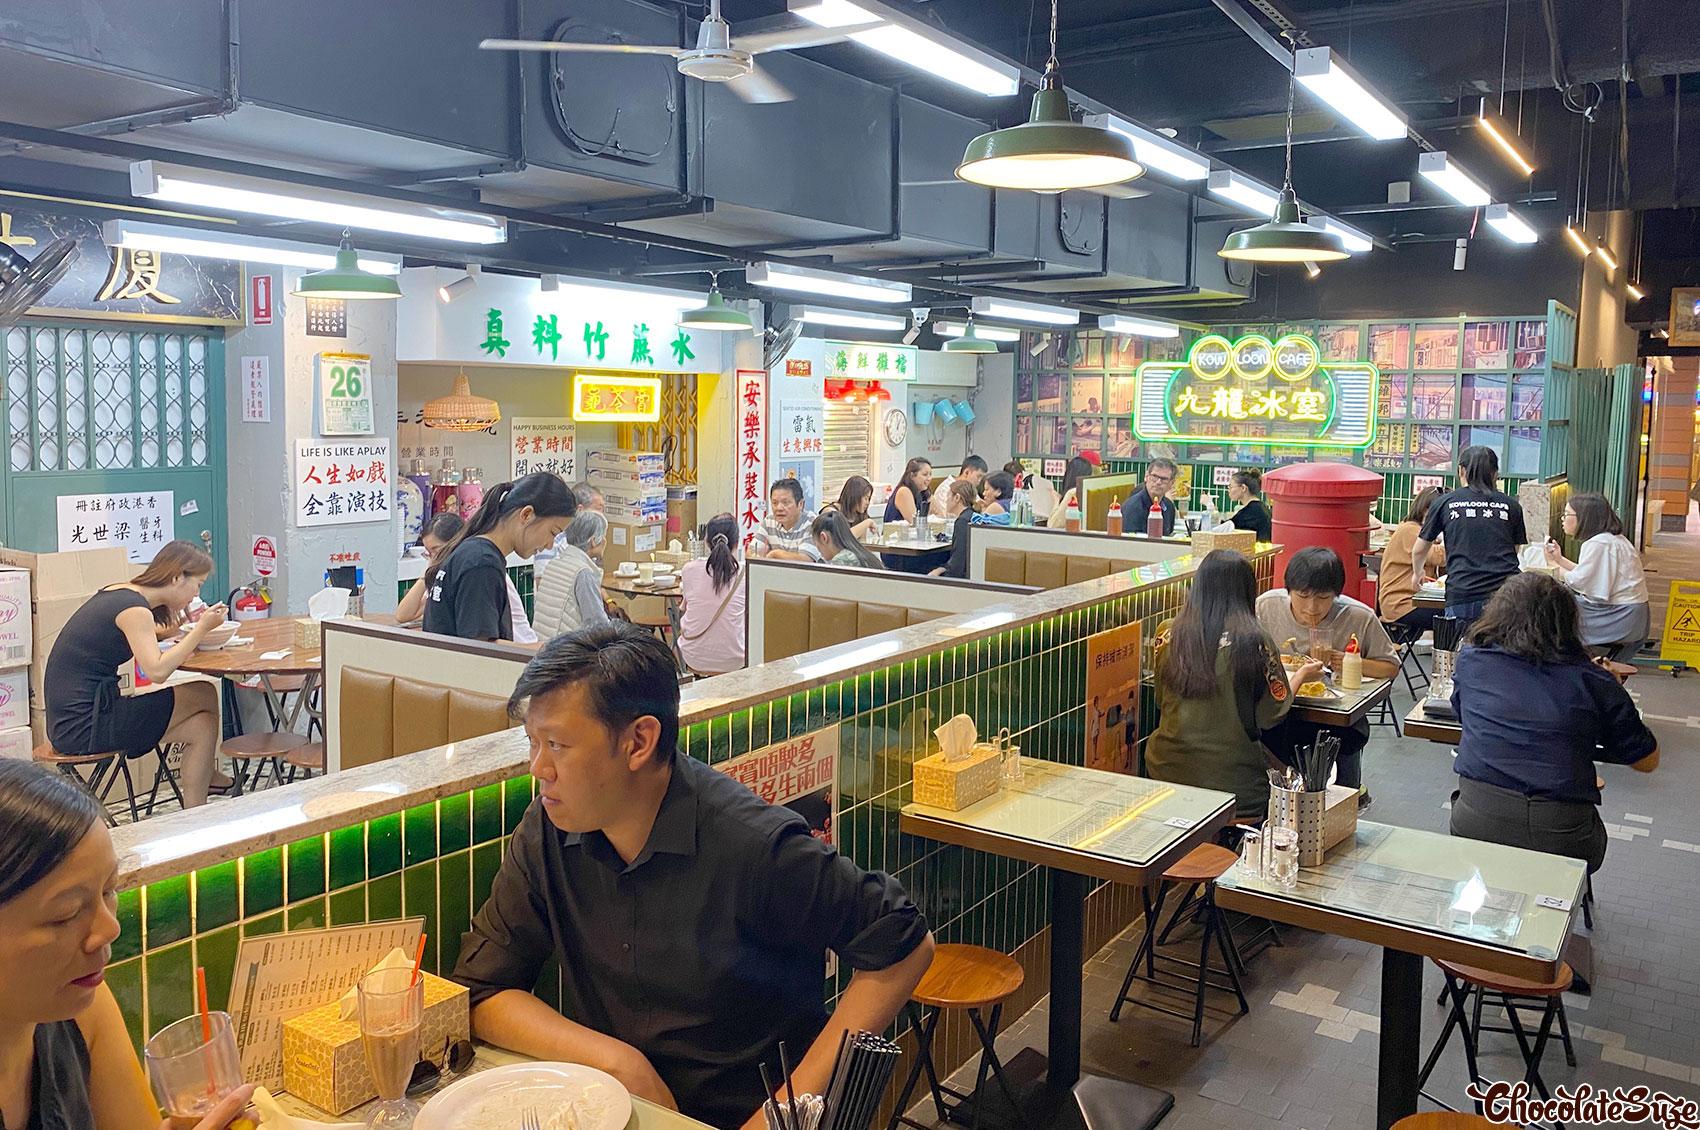 Inside restaurant at Kowloon Cafe, Haymarket